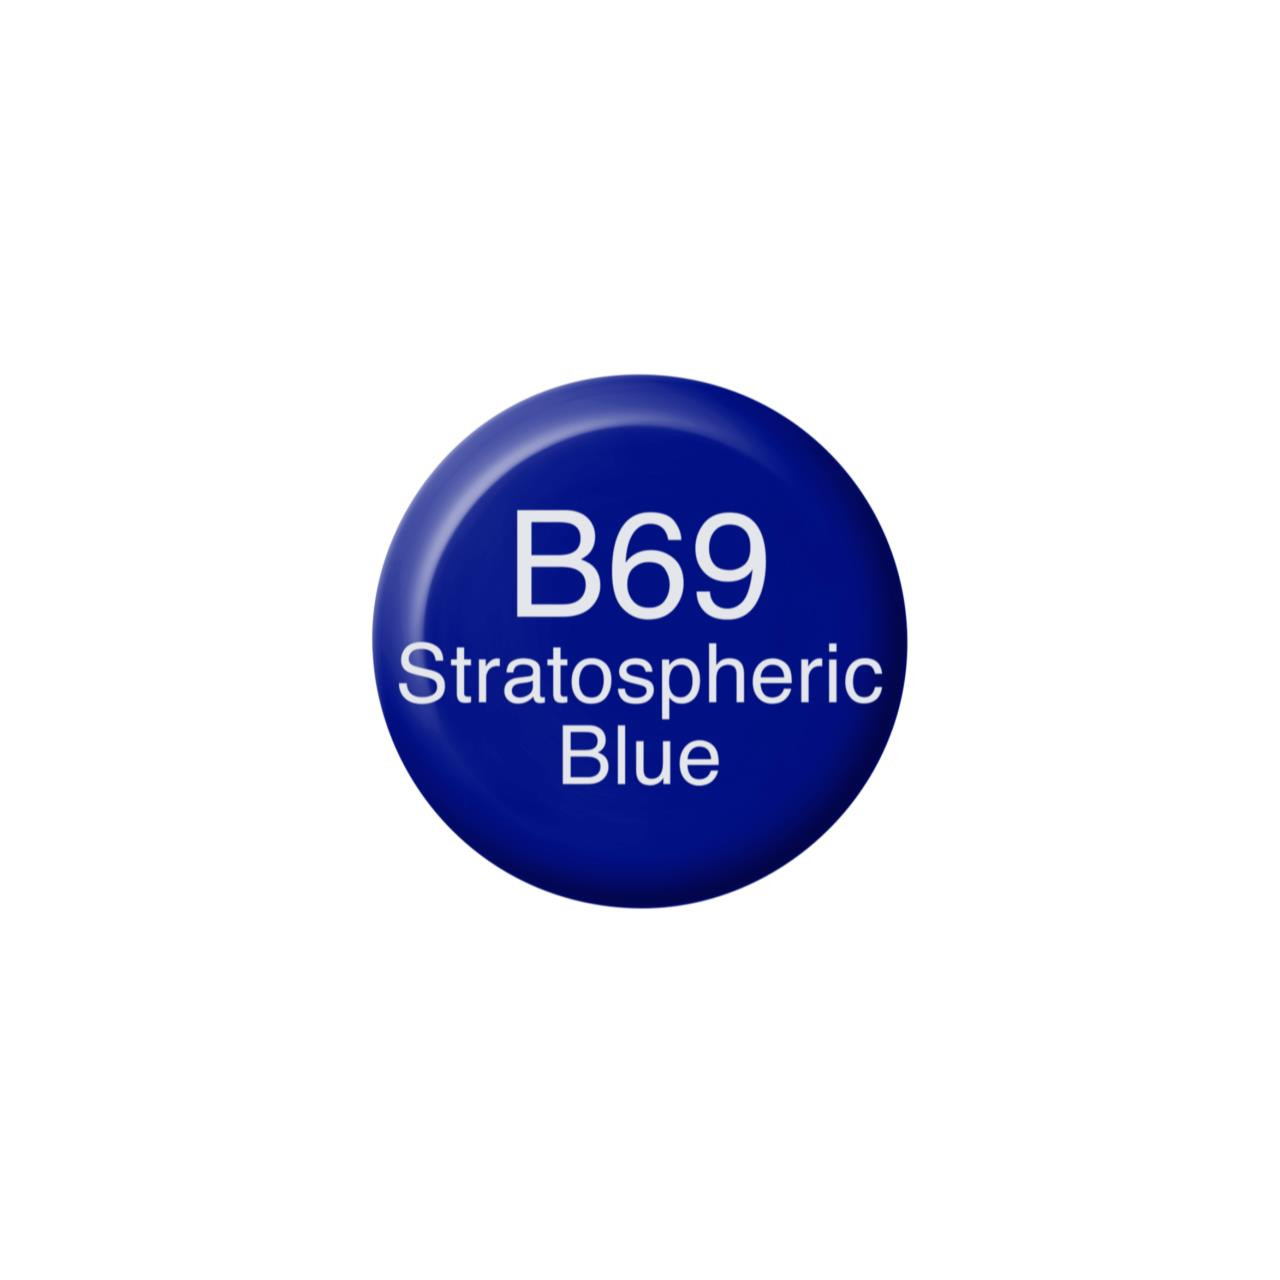 B69 Stratospheric Blue, Copic Ink - 4511338056080